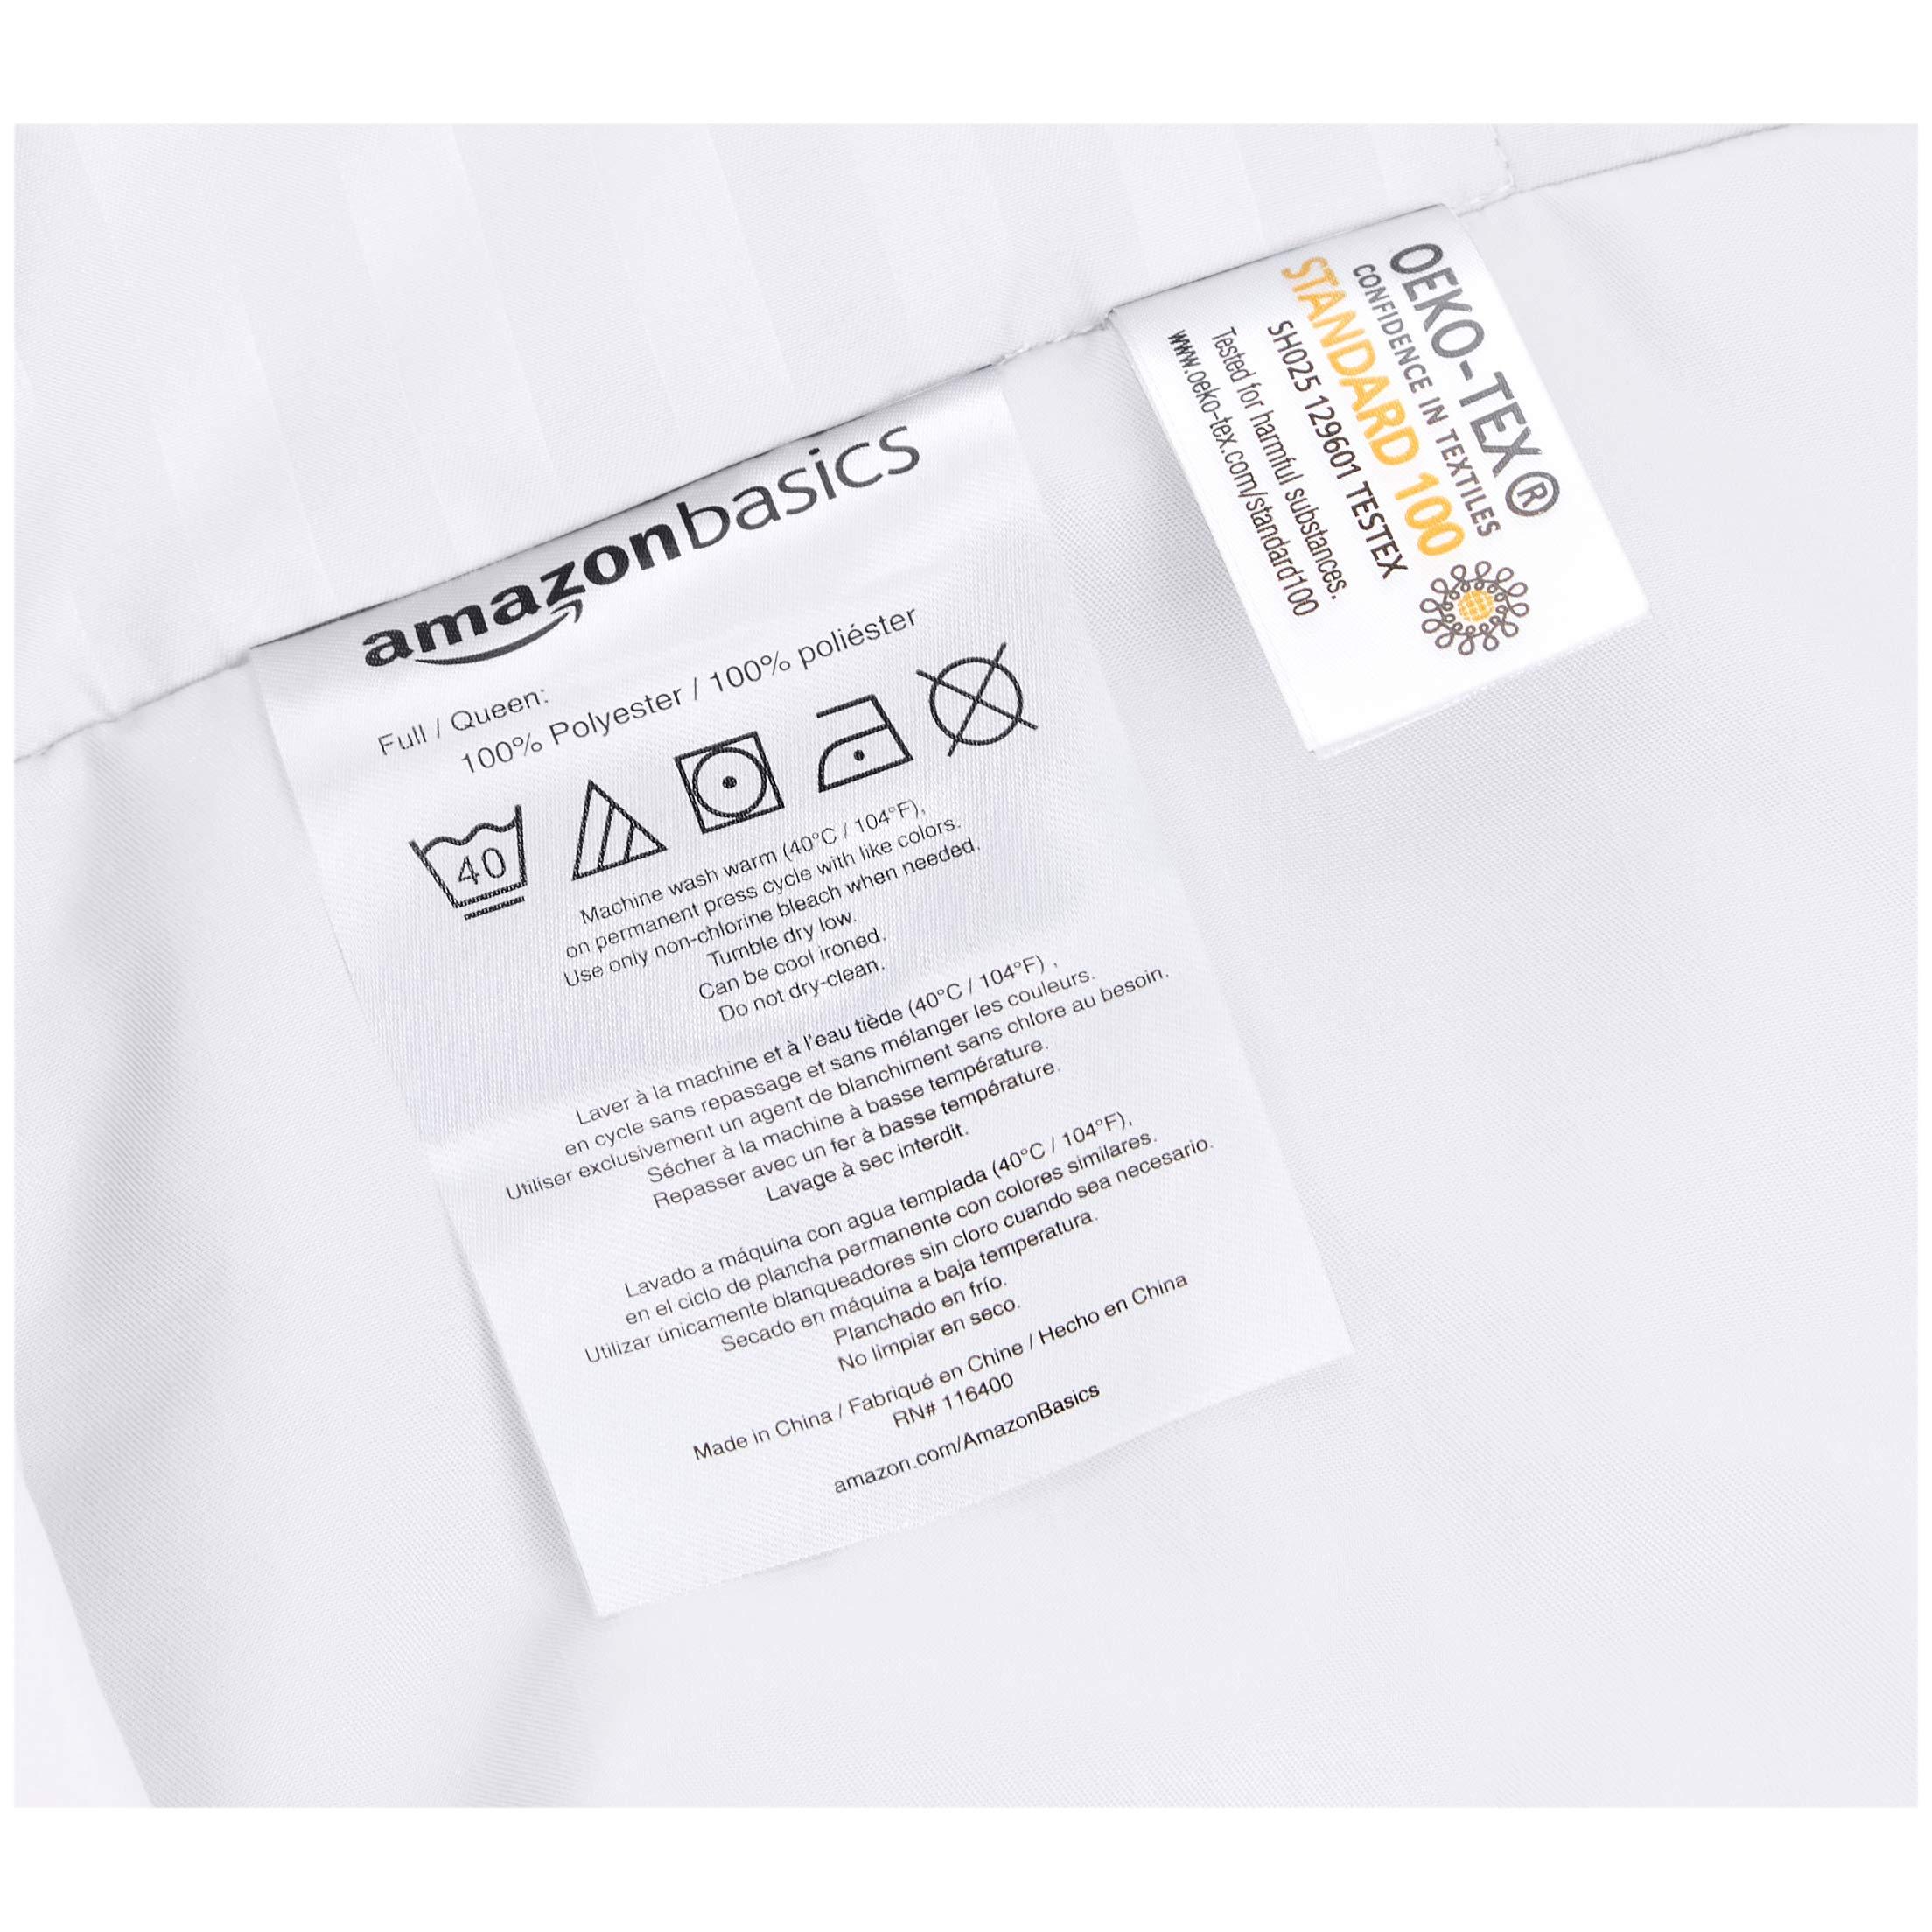 AmazonBasics Deluxe Striped Microfiber Duvet Cover Set - Full or Queen, Bright White by AmazonBasics (Image #6)